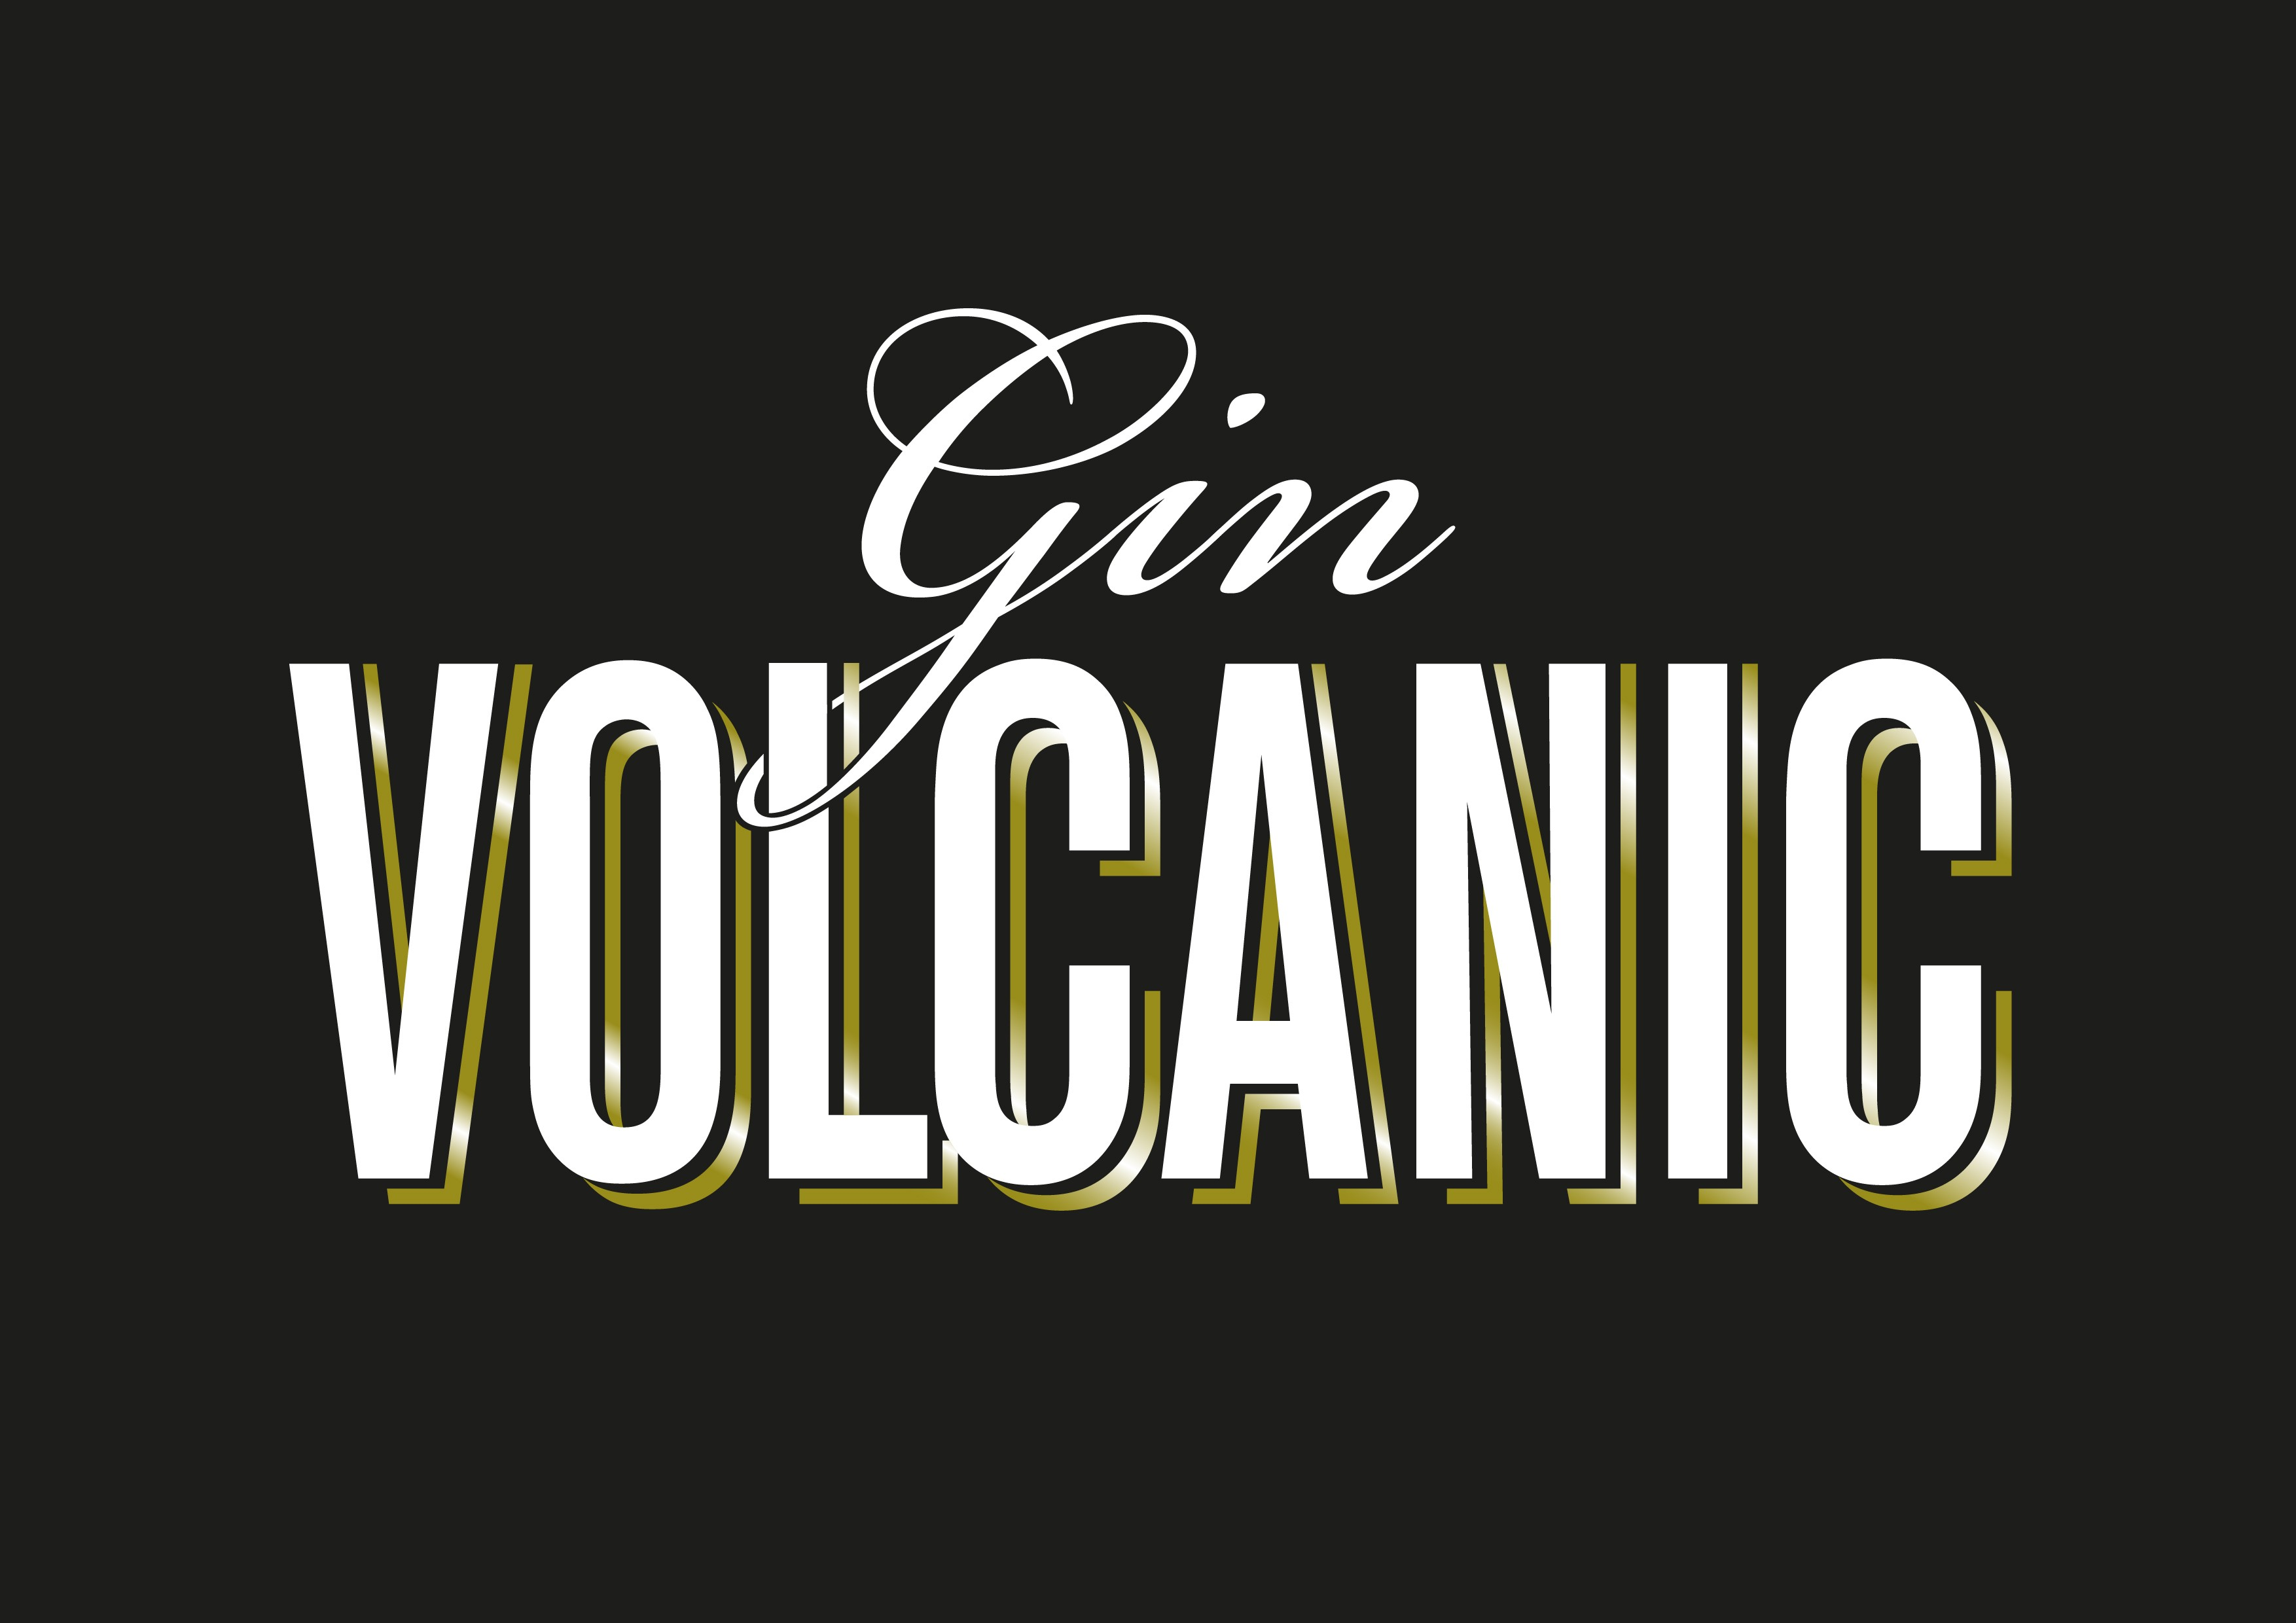 Volcanic (Gin)